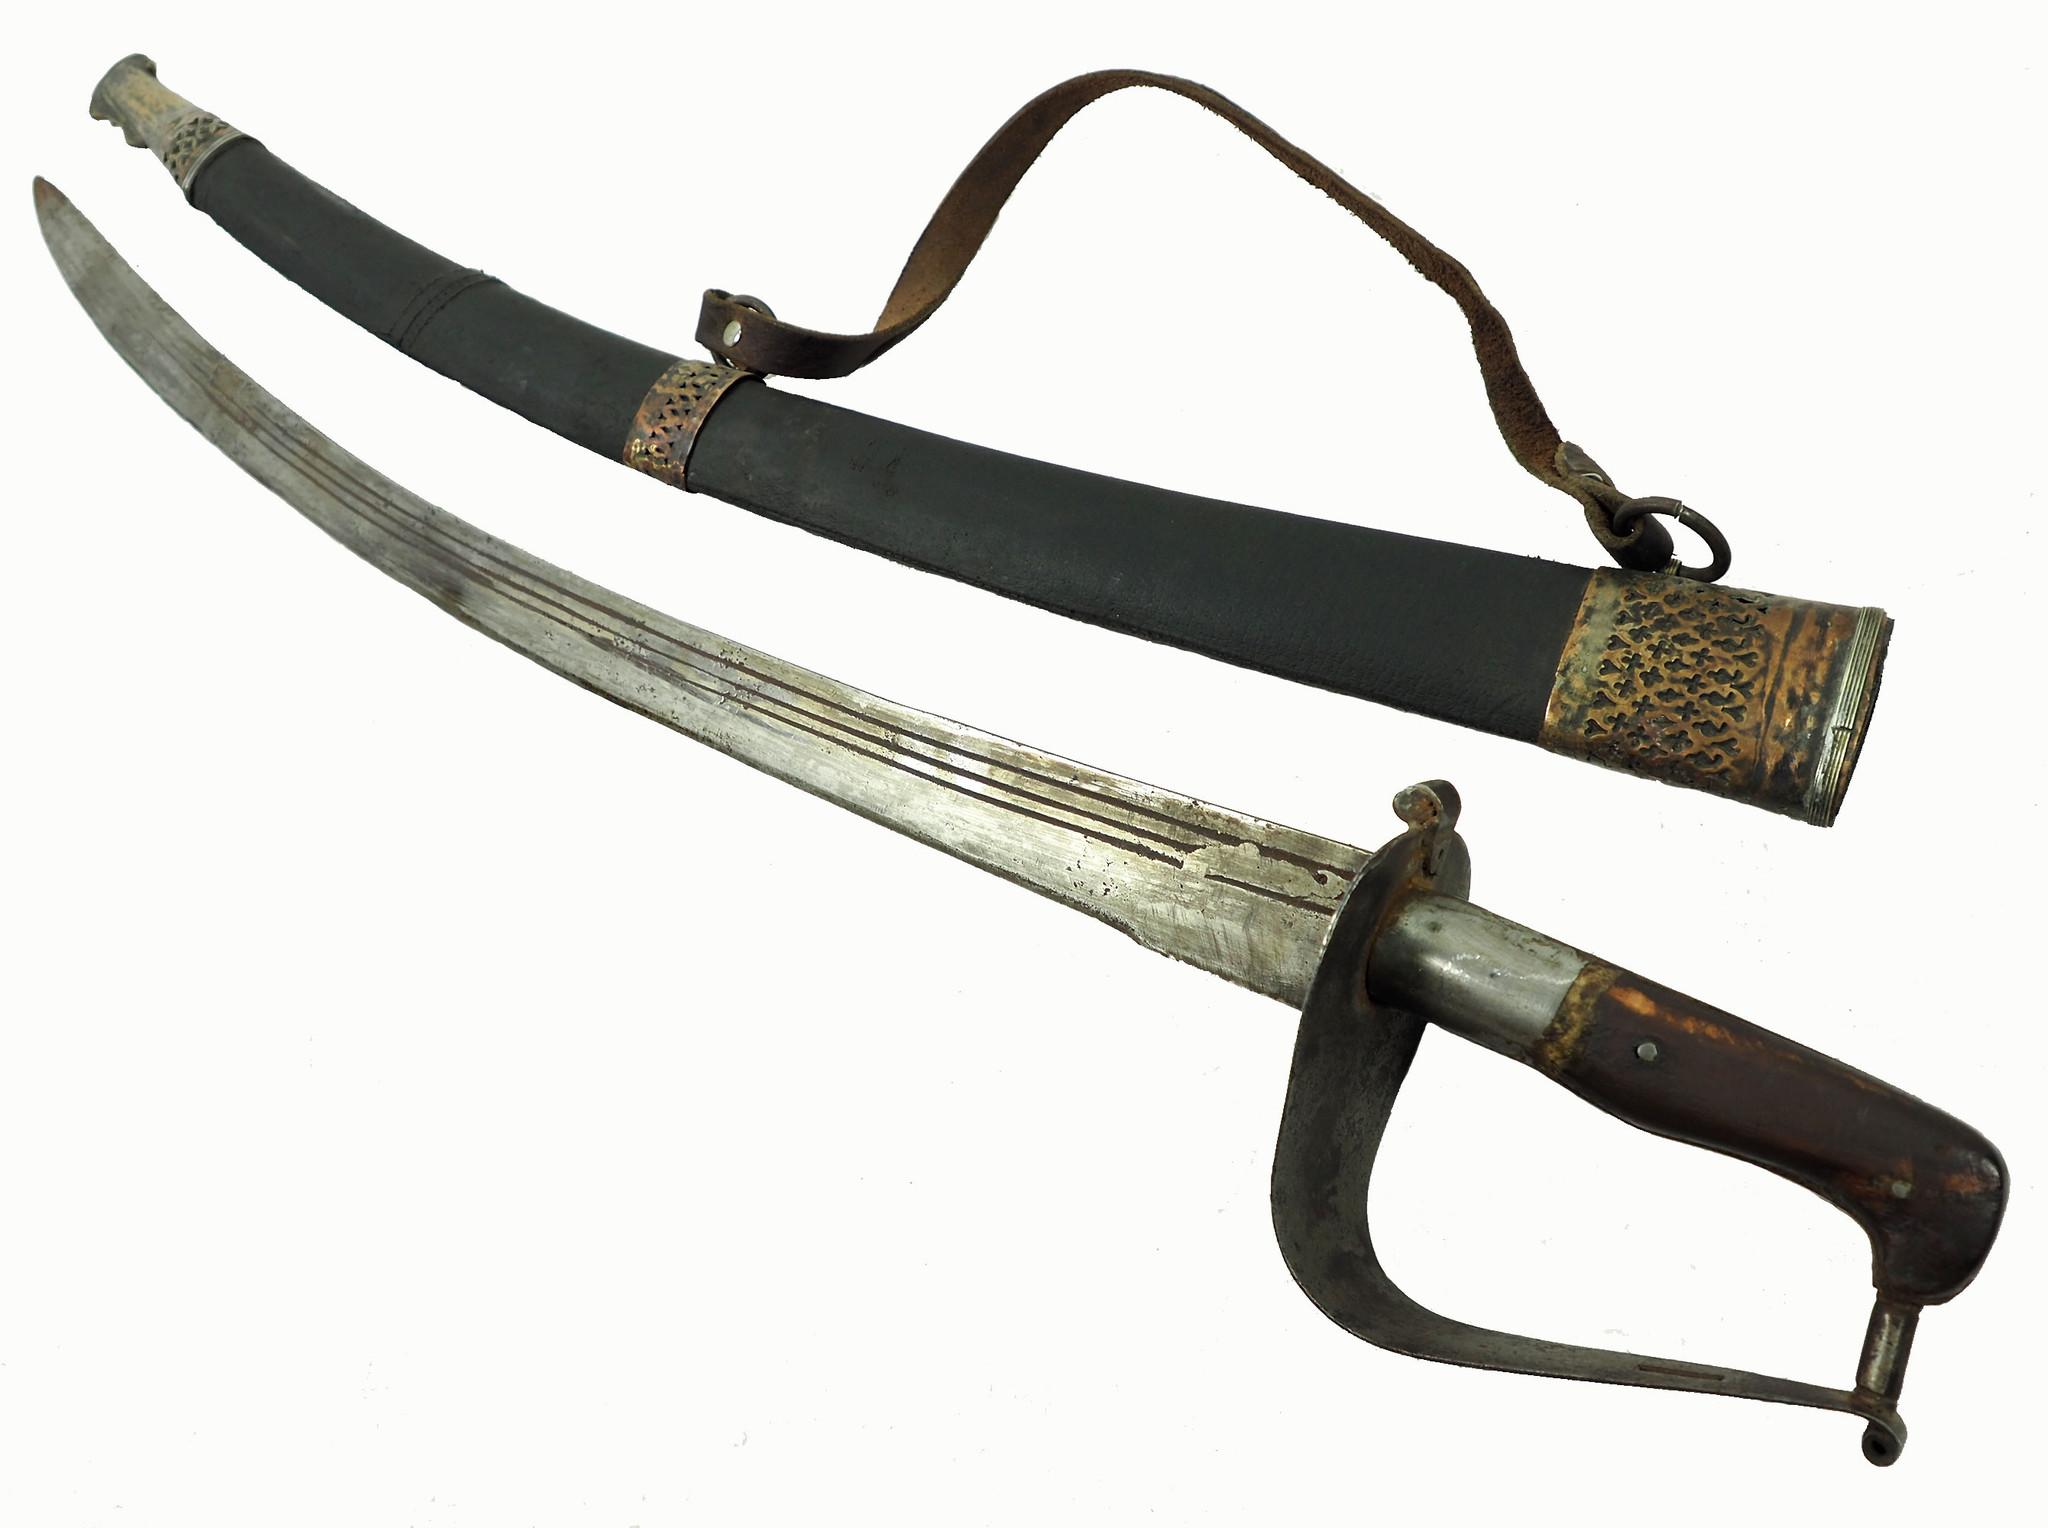 Antique islamic Sword Shamshir from Afghanistan No: 19/J